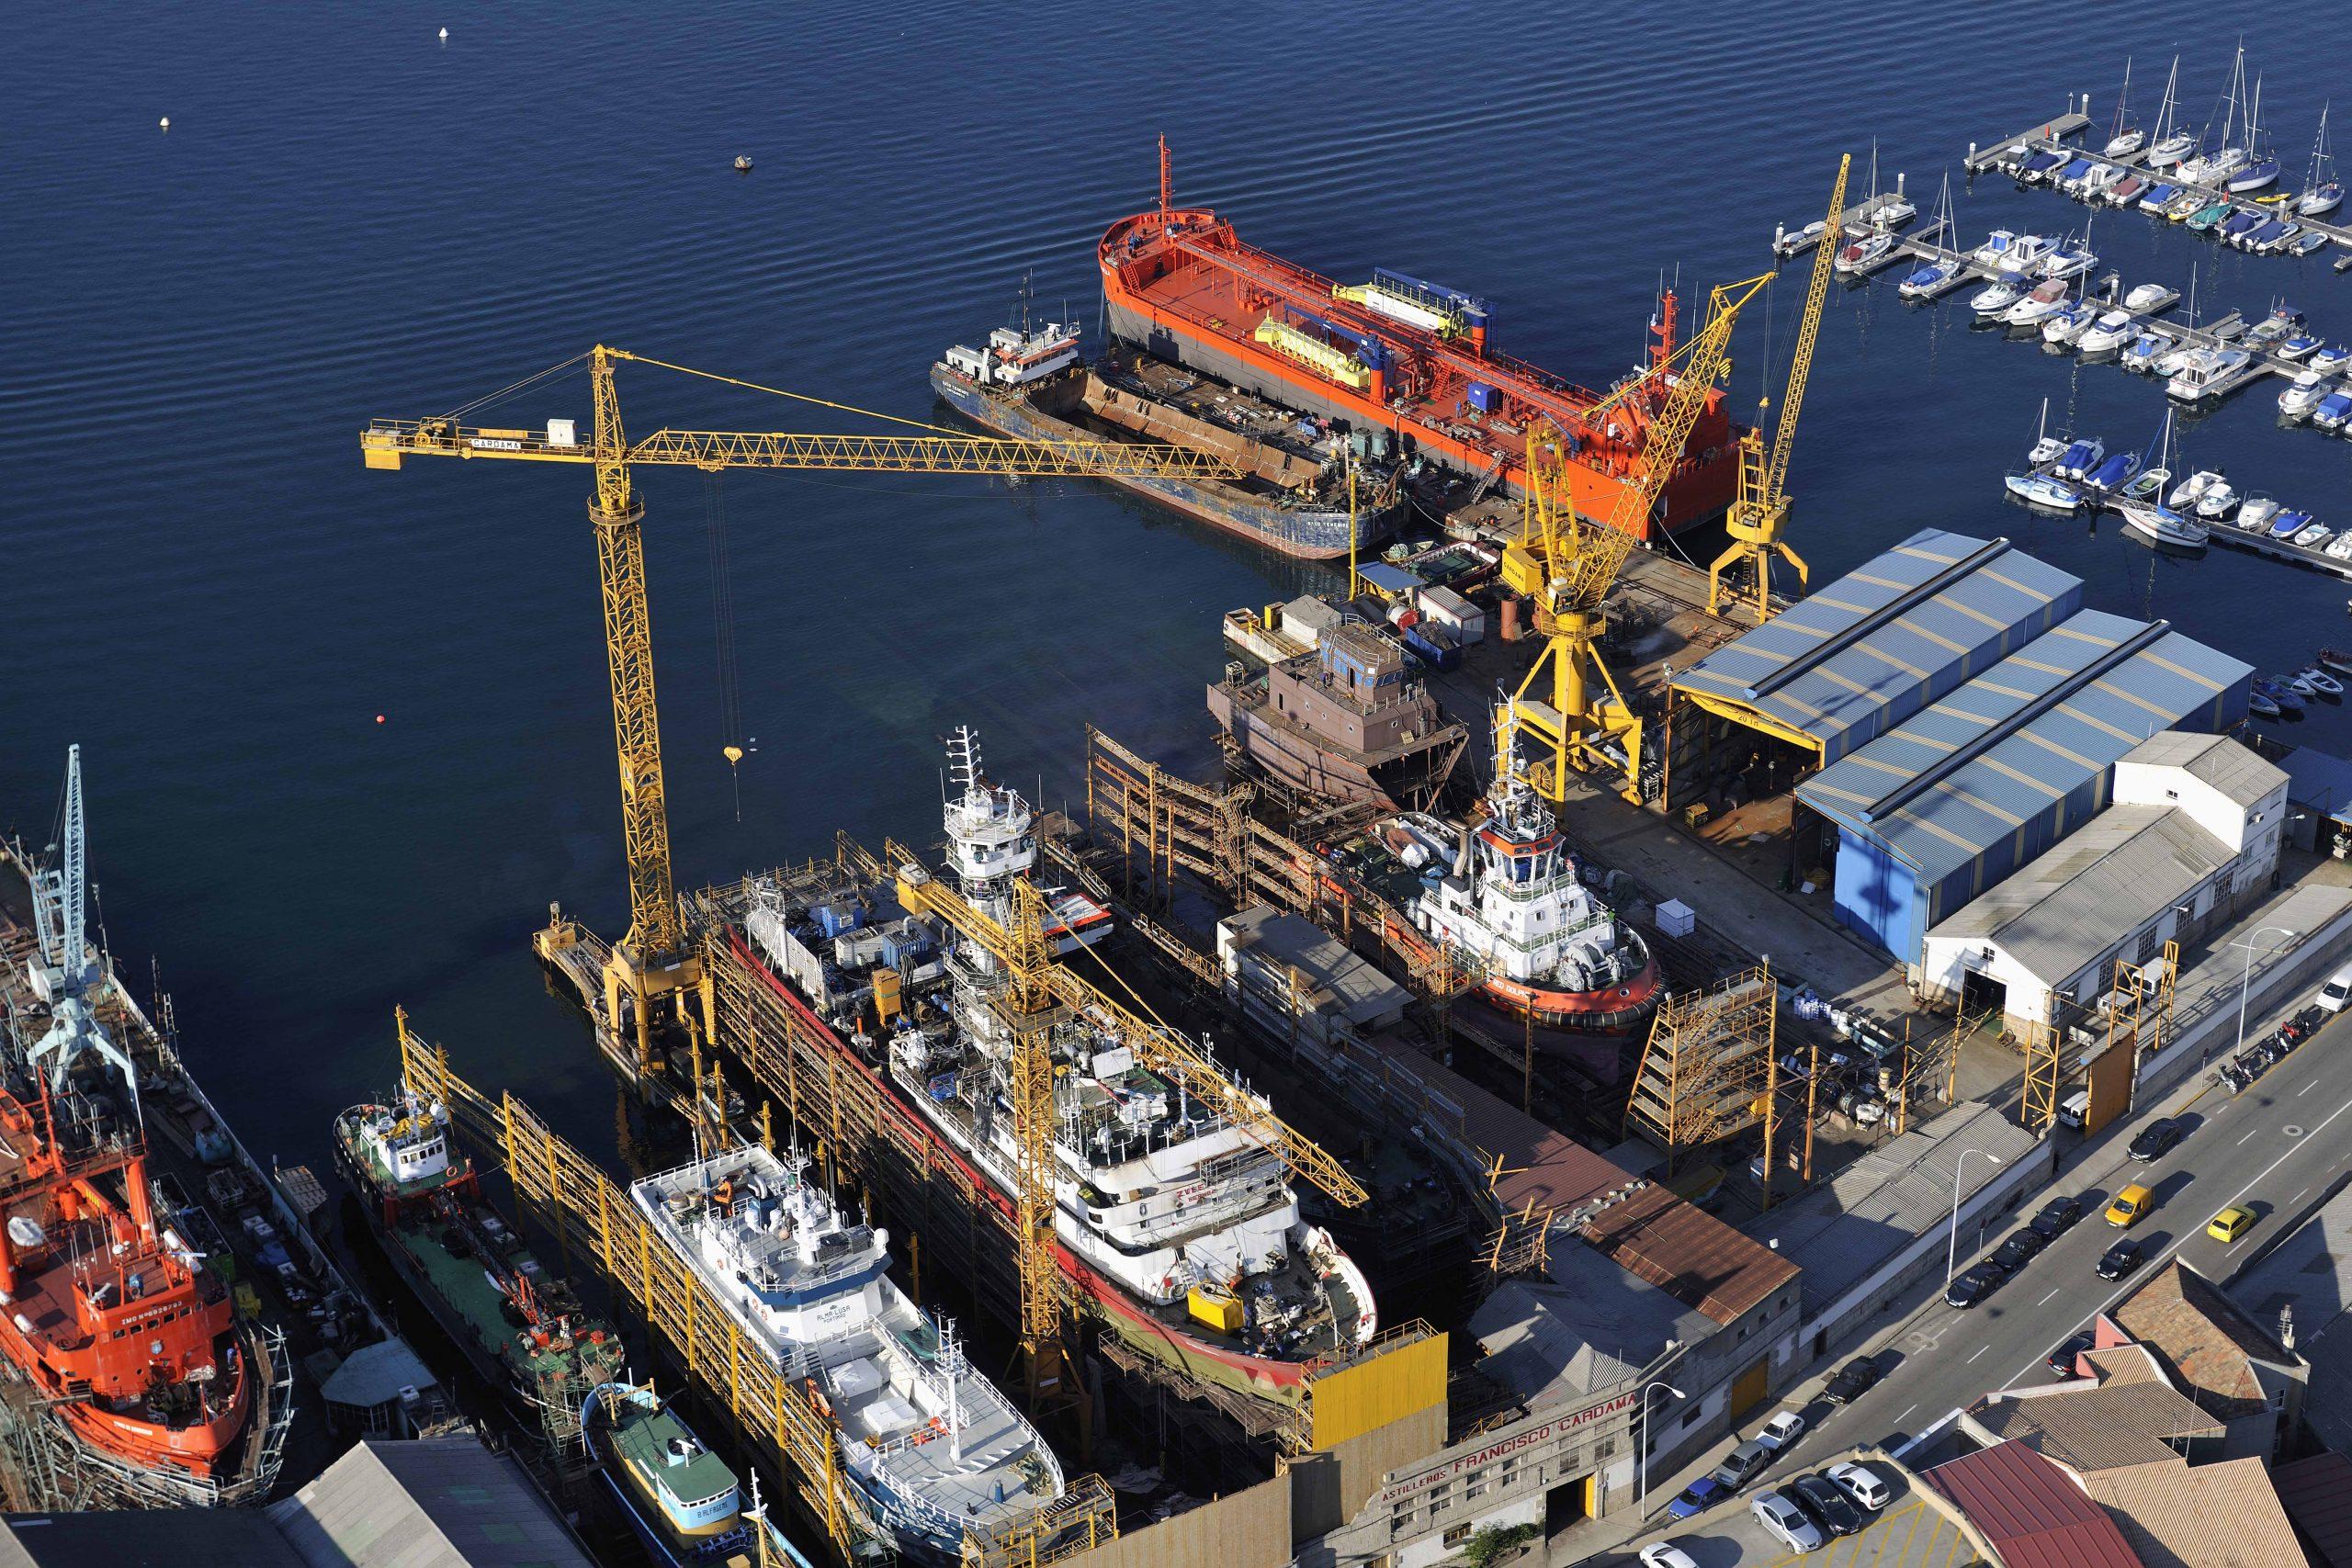 Cardama Shipyard vista aérea